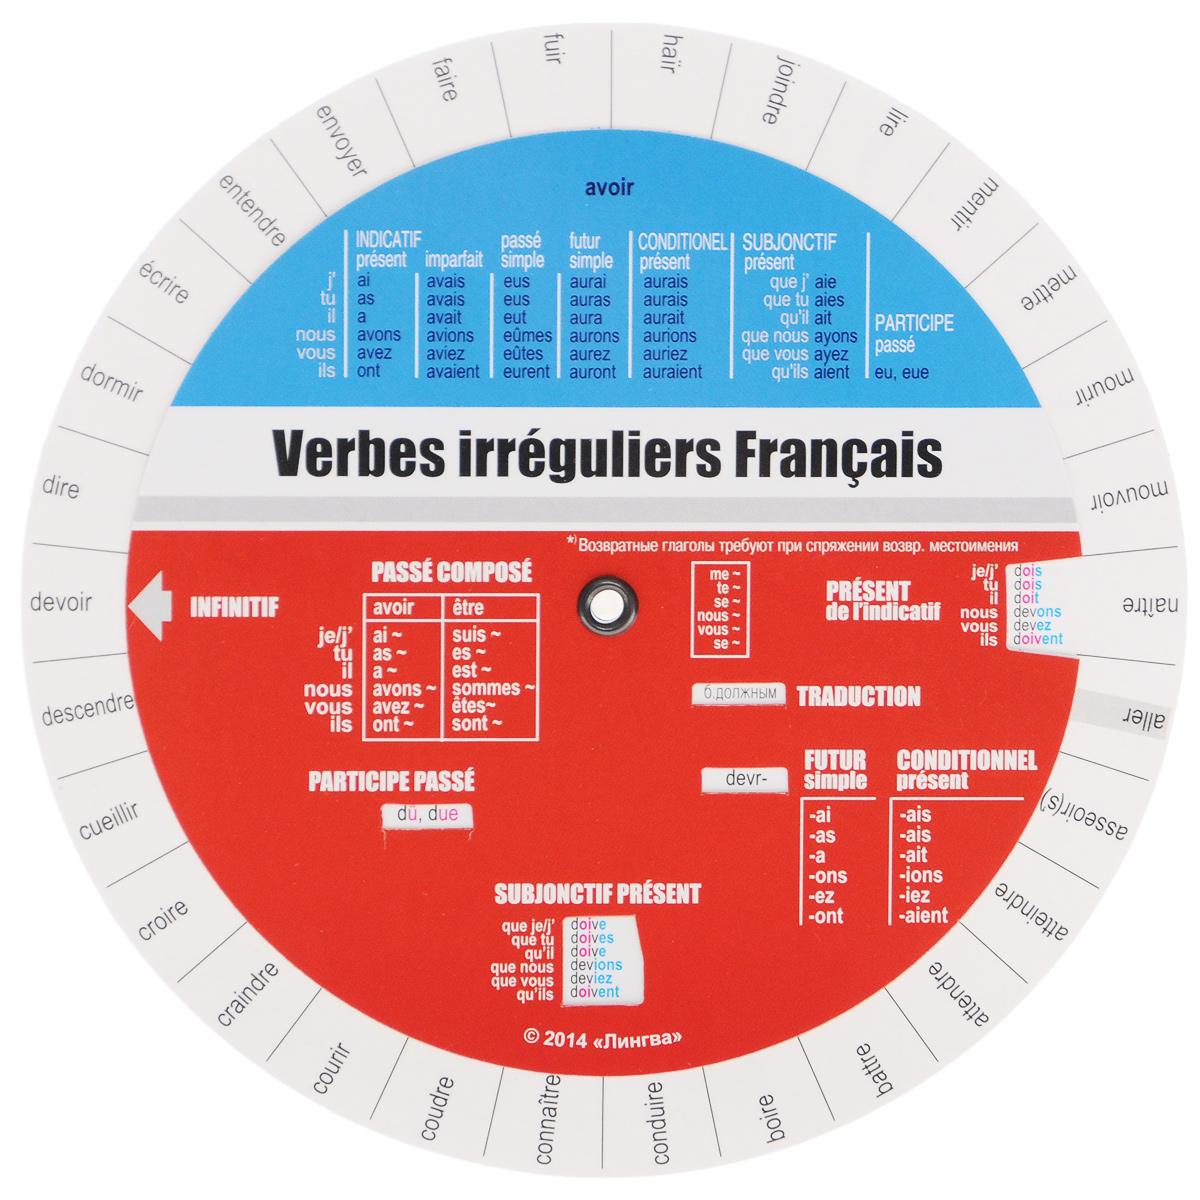 Verbes irreguliers Francais / Французские неправильные глаголы. Таблица ( 978-5-98265-026-9 )